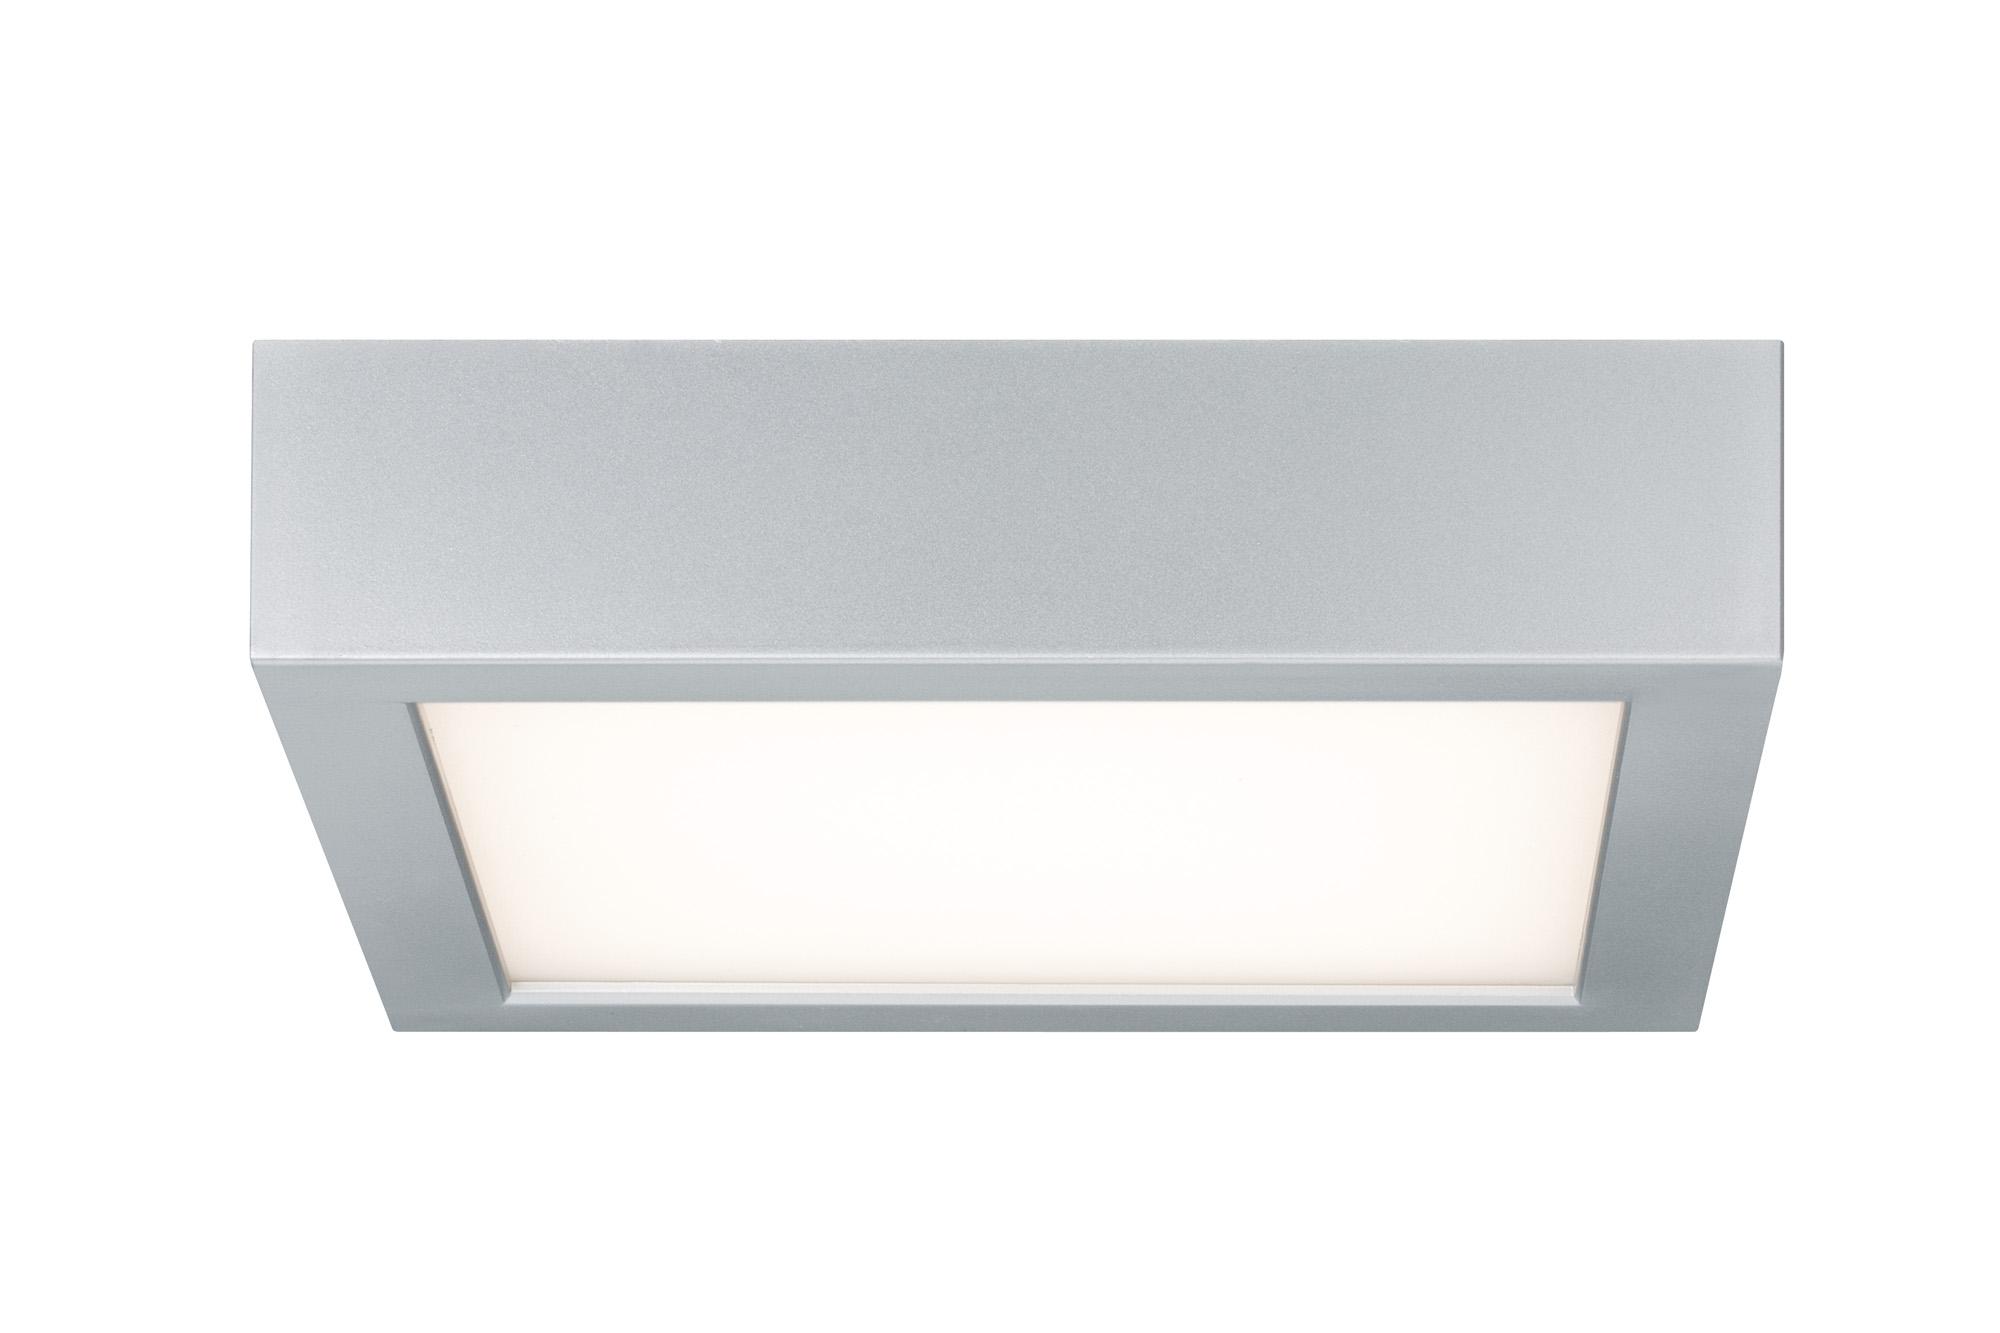 wand deckenleuchte space led panel 11w chrom matt wei kunststoff 70387. Black Bedroom Furniture Sets. Home Design Ideas